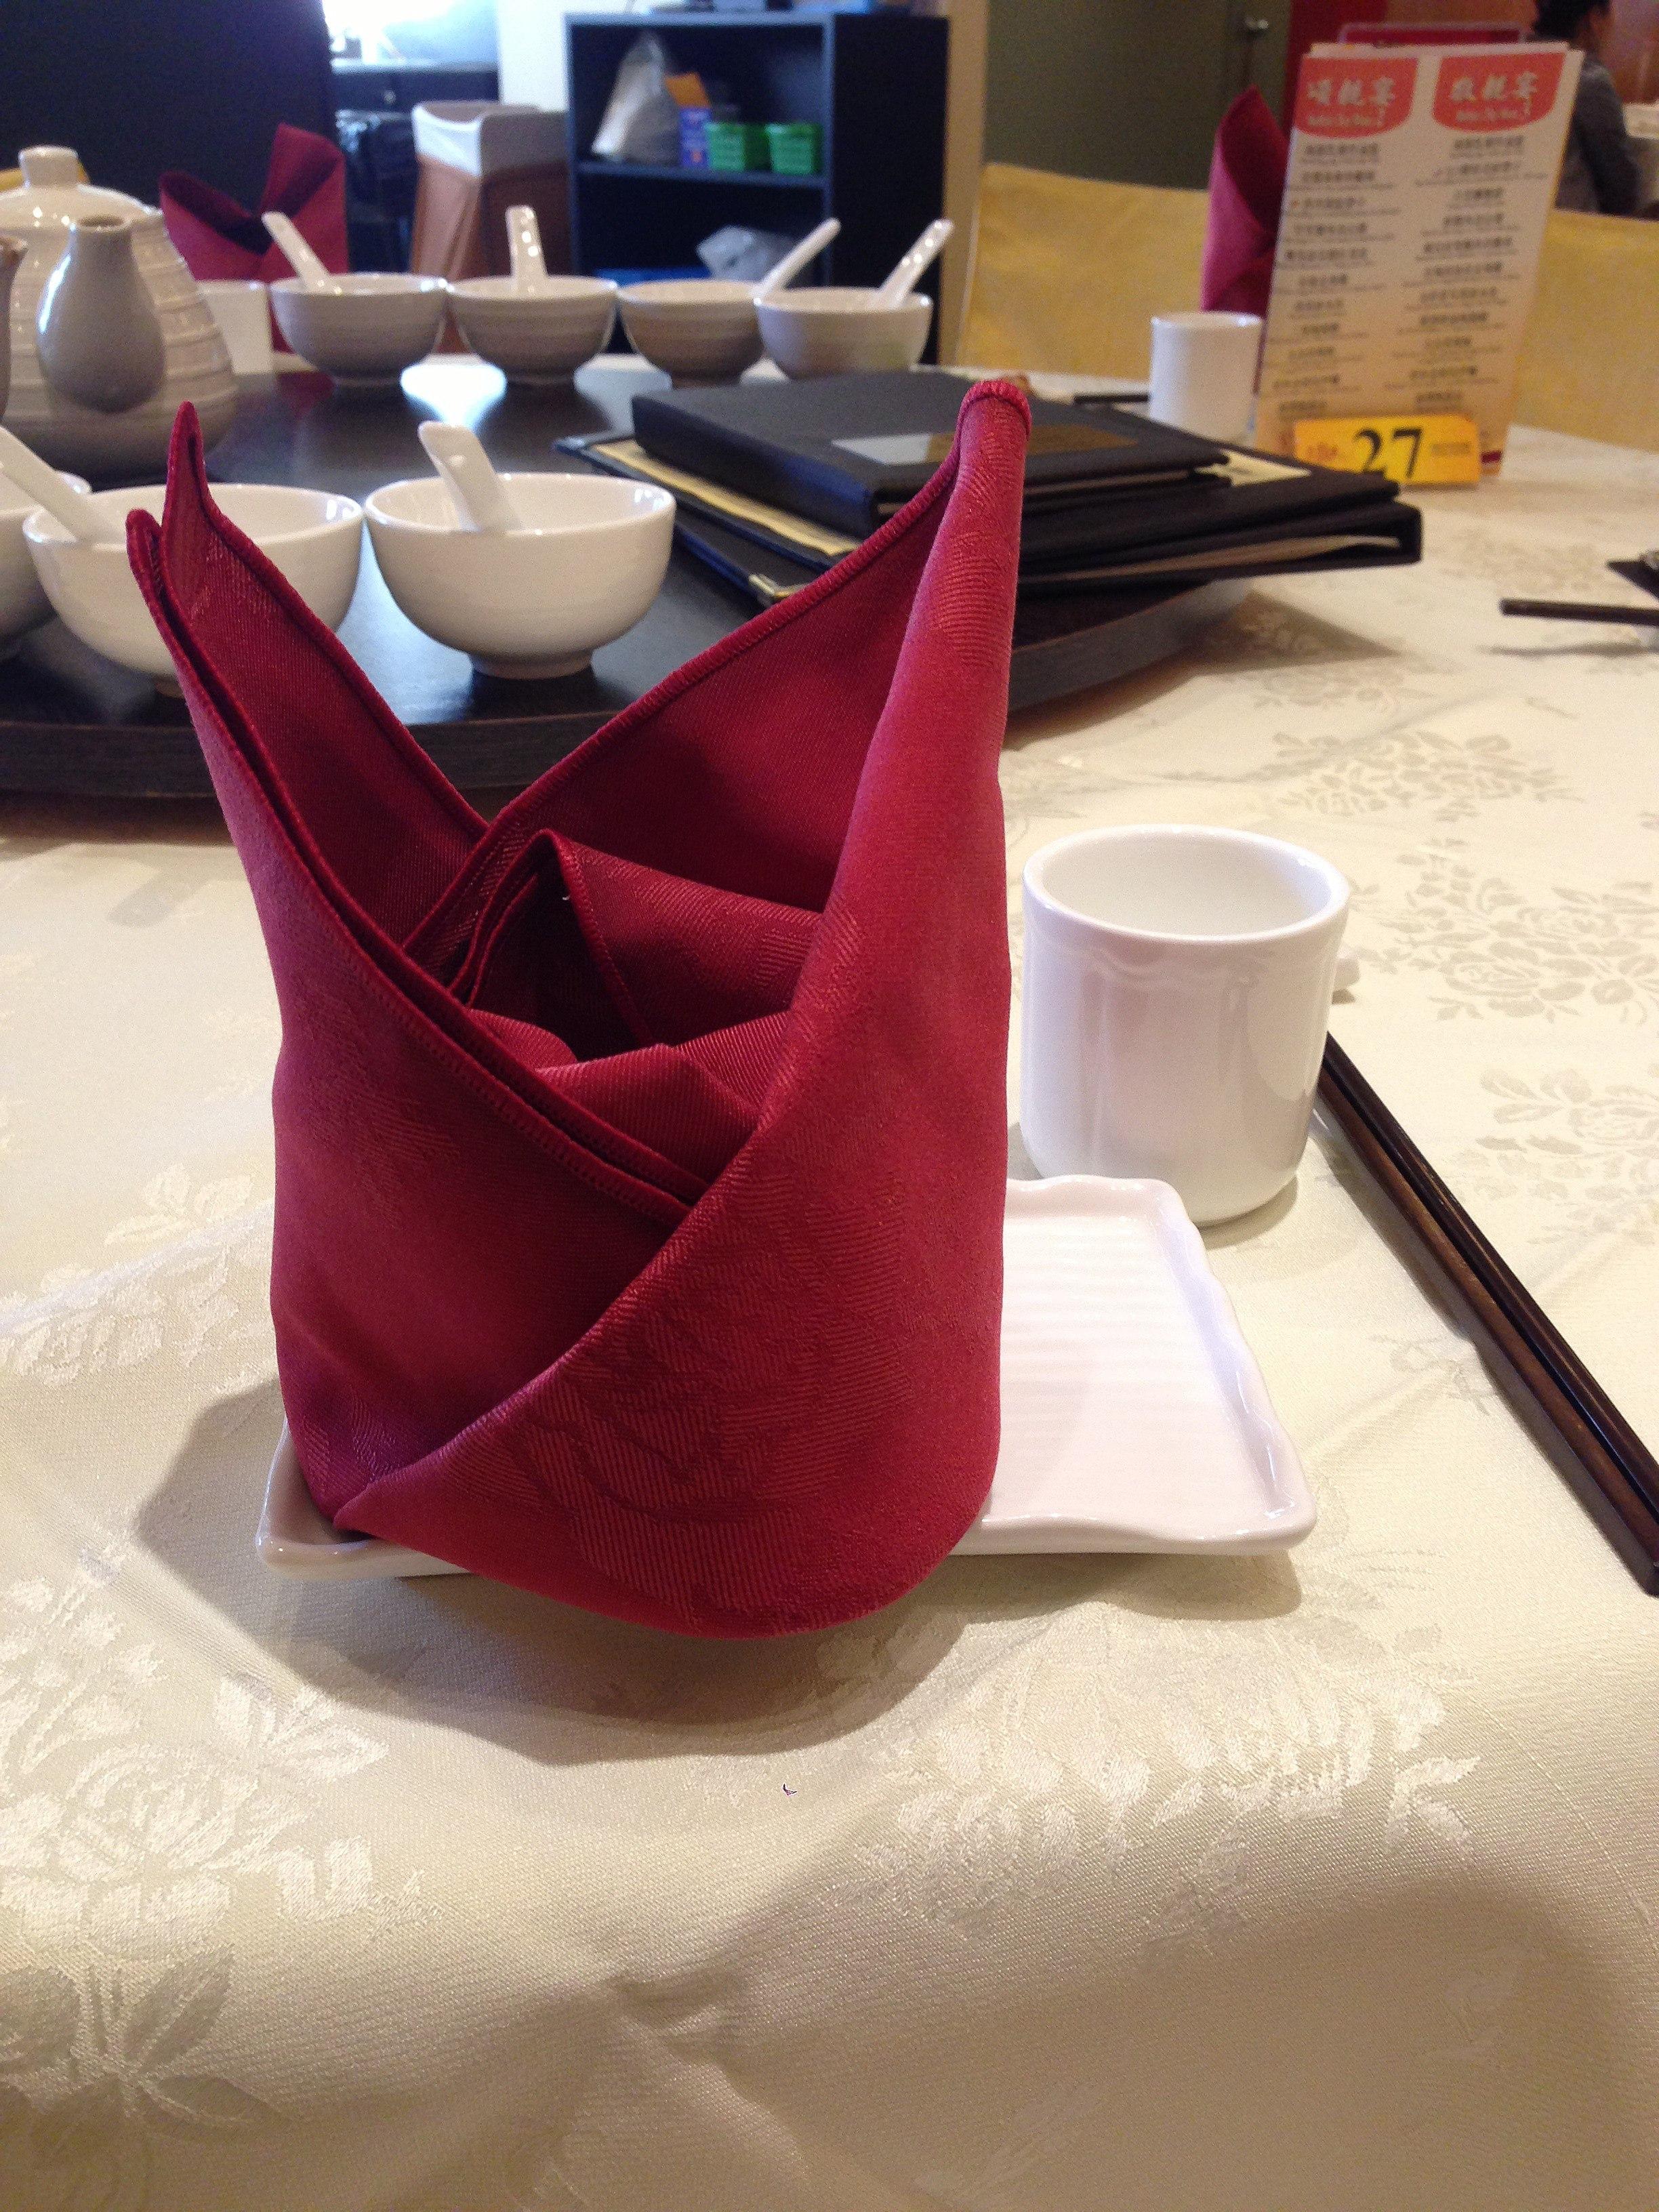 FileAsian Restaurant Table Settingjpeg